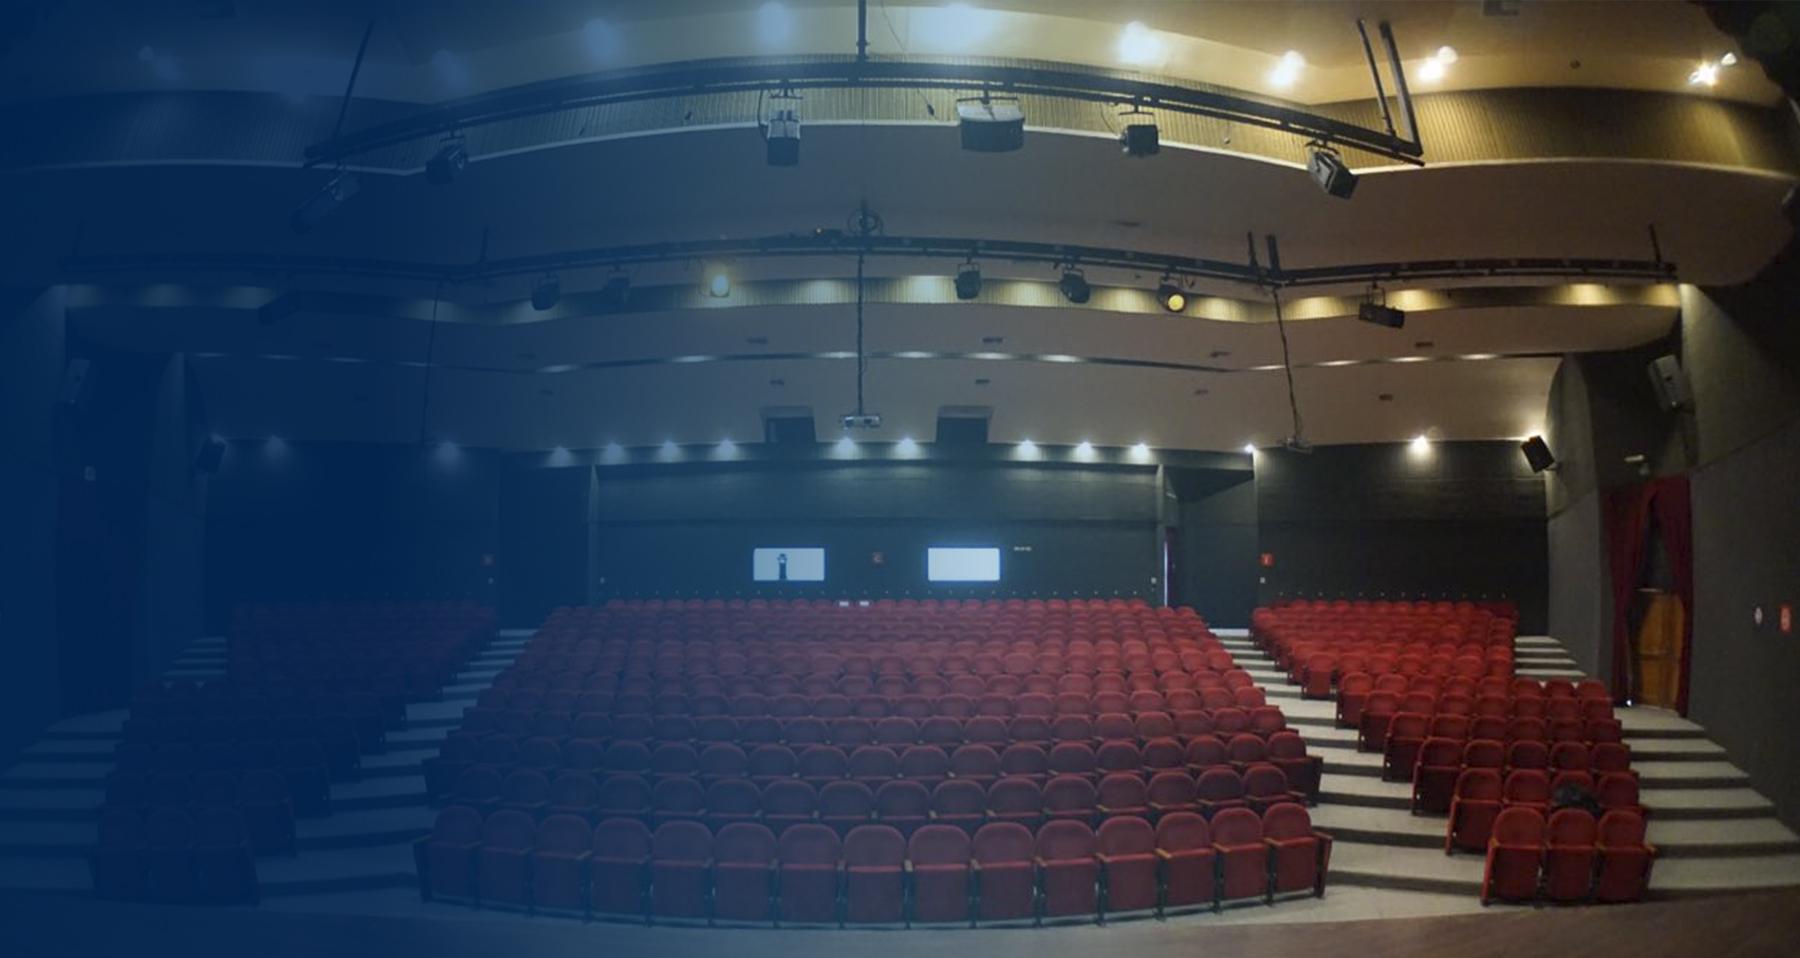 Teatro Eagles